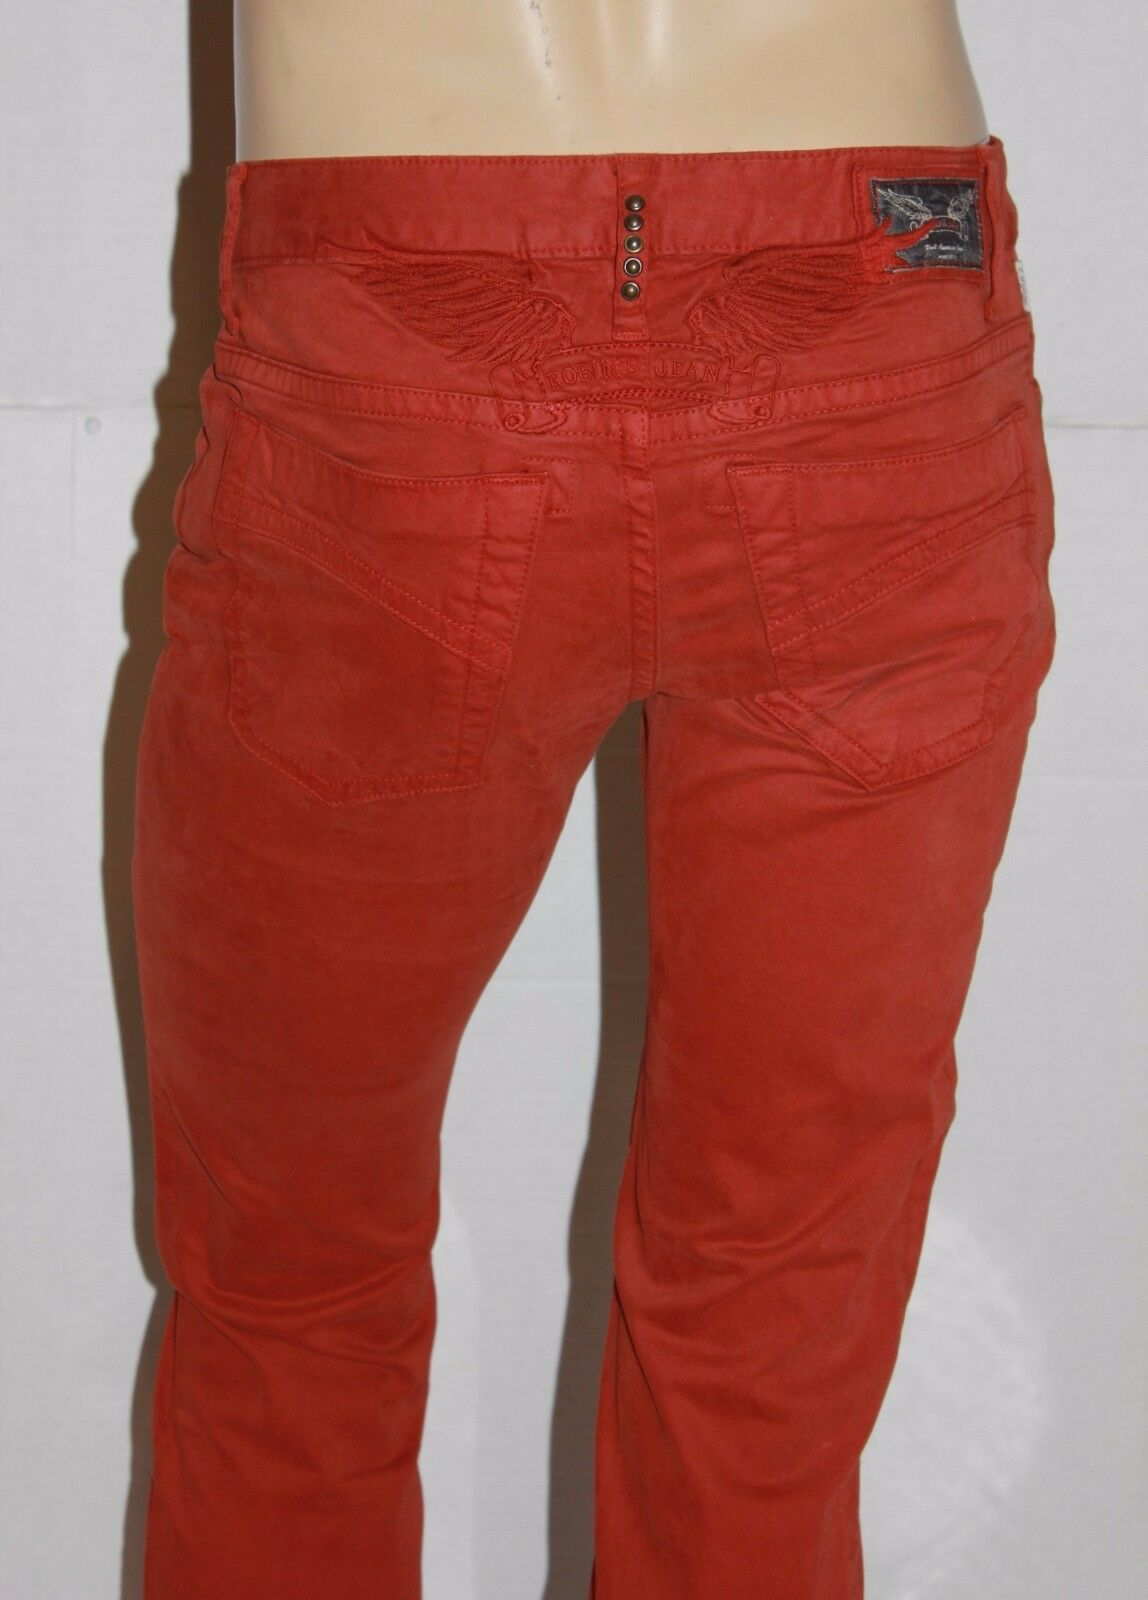 New Men'S ROBIN'S JEAN Style  SP5471 MARLON Straight Leg Pants Jeans - orange